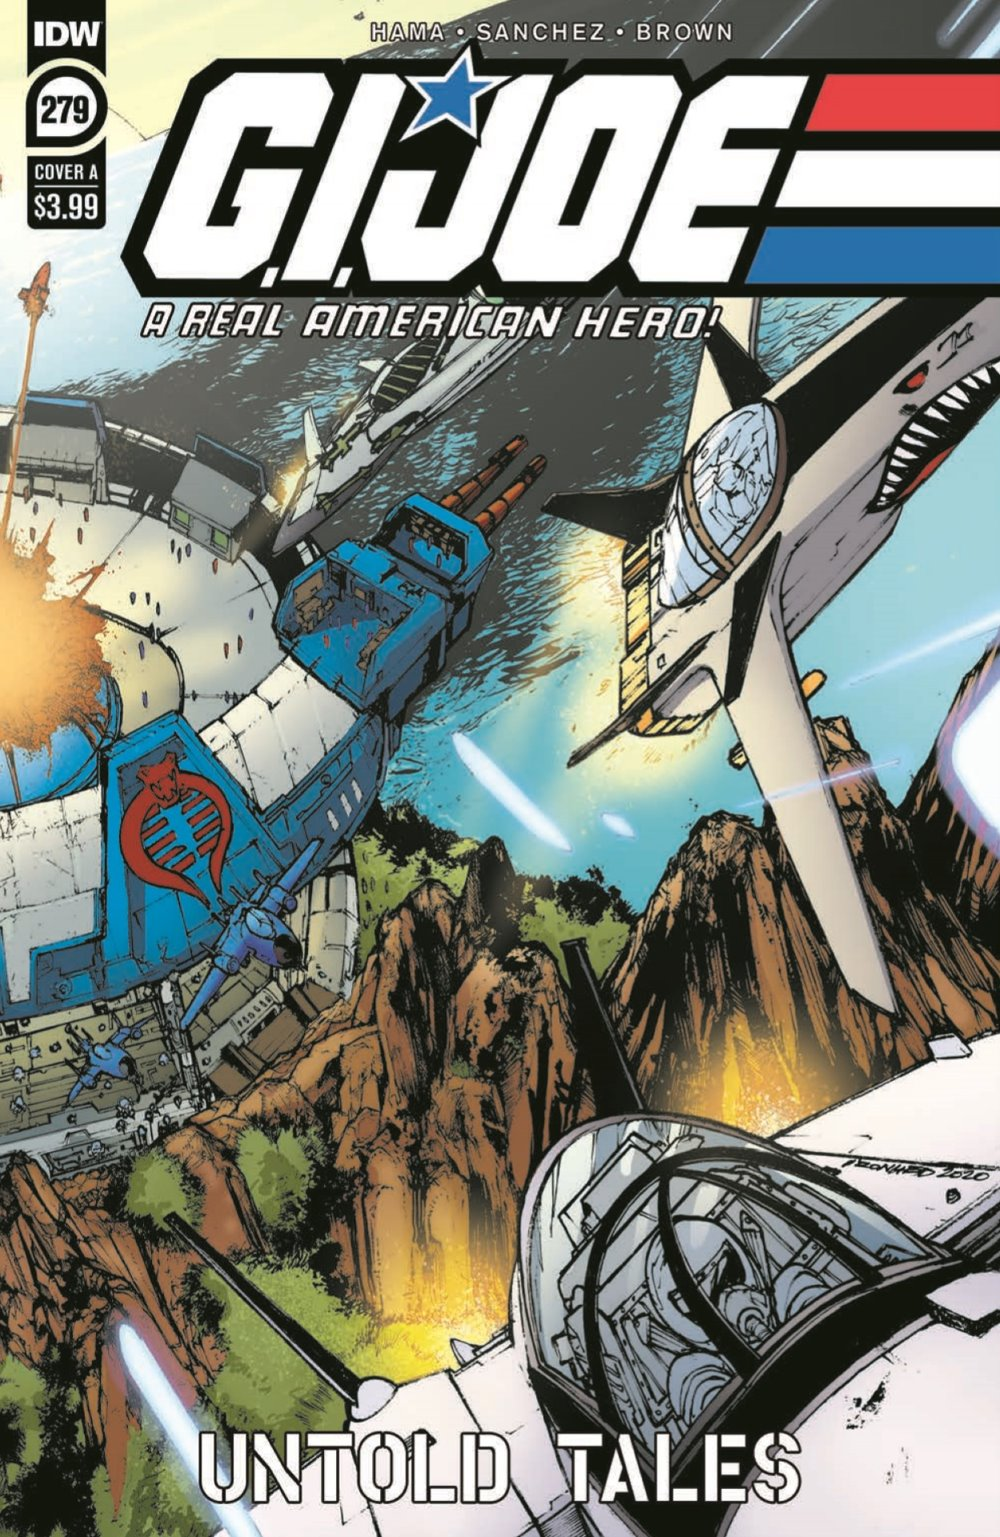 GIJoeRAH279-pr-1 ComicList Previews: G.I. JOE A REAL AMERICAN HERO #279